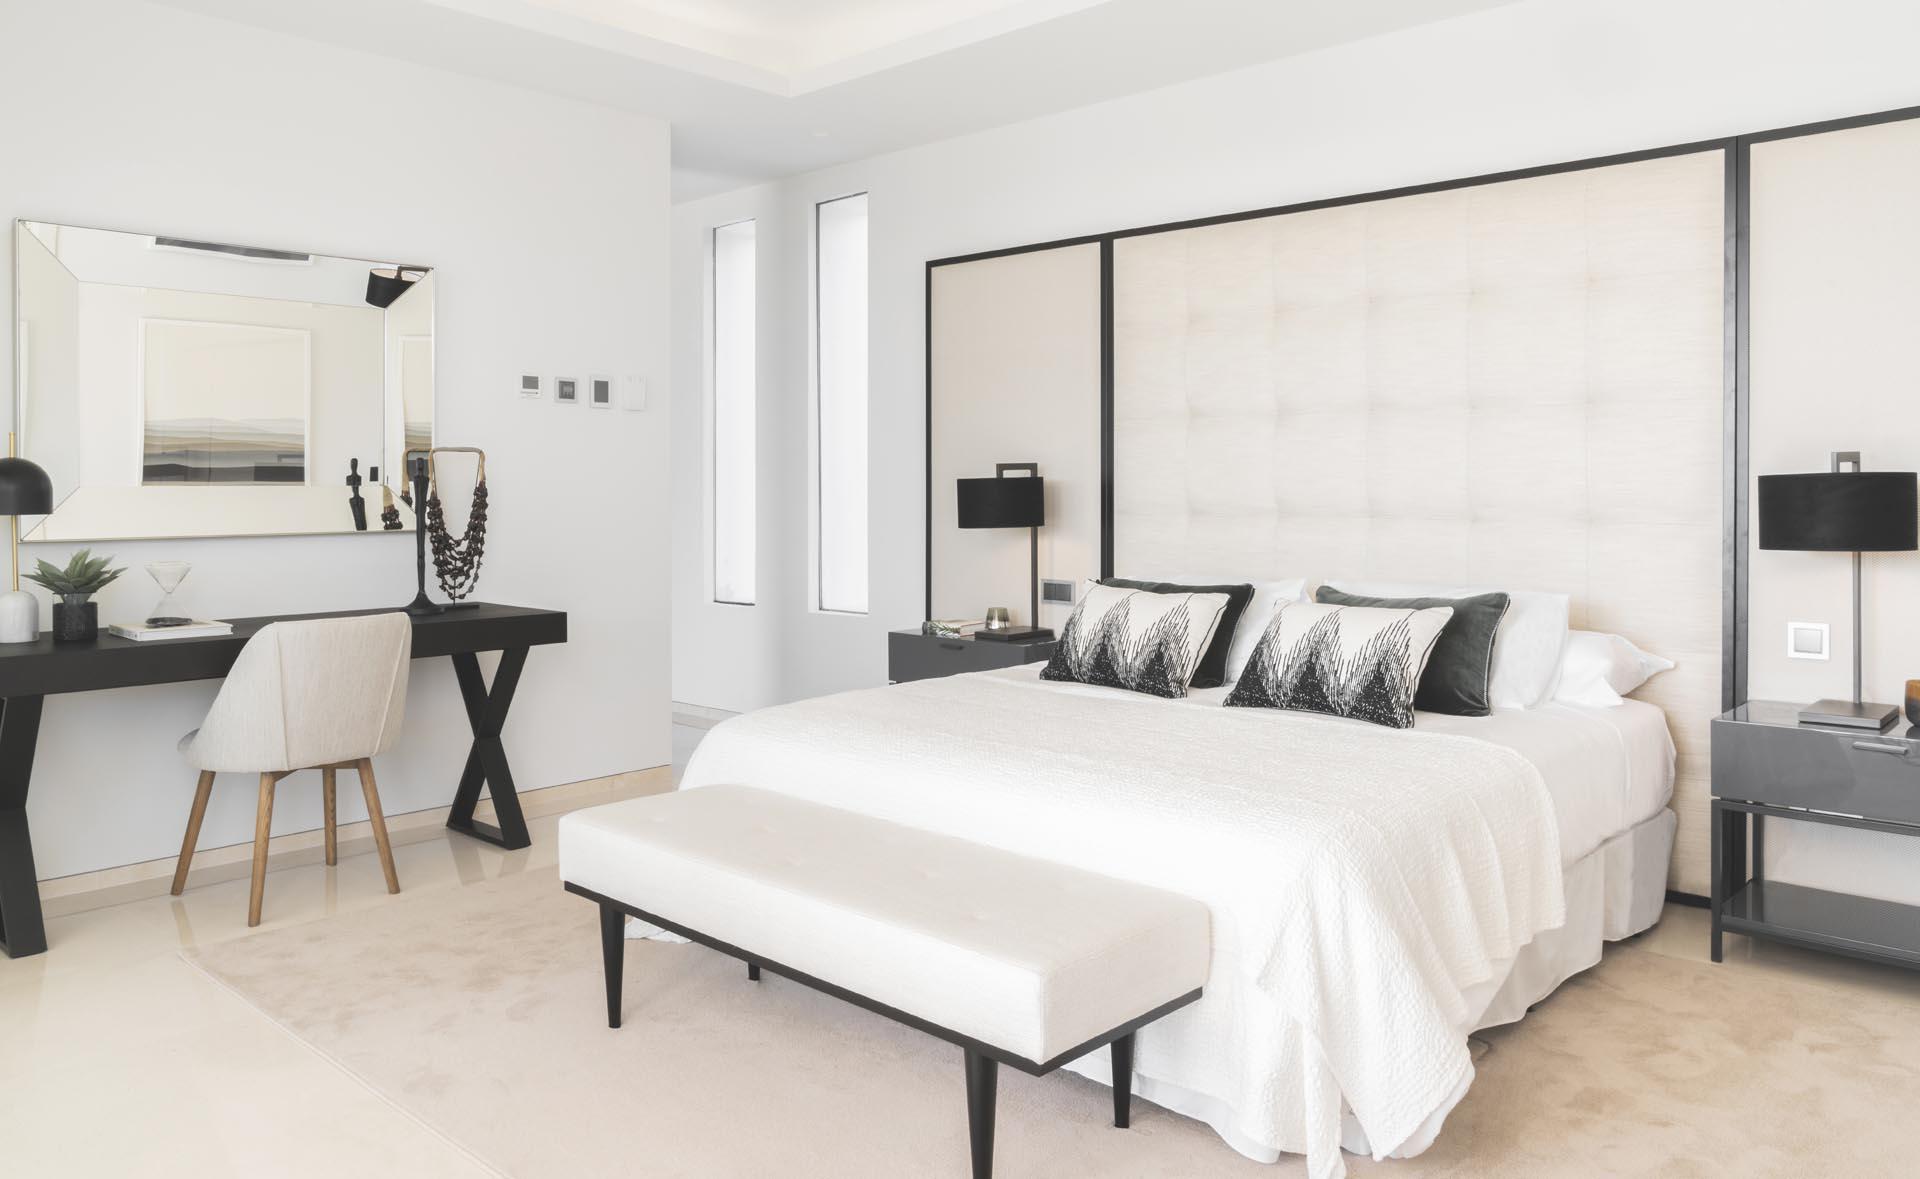 interiorista marbella dormitorio vista